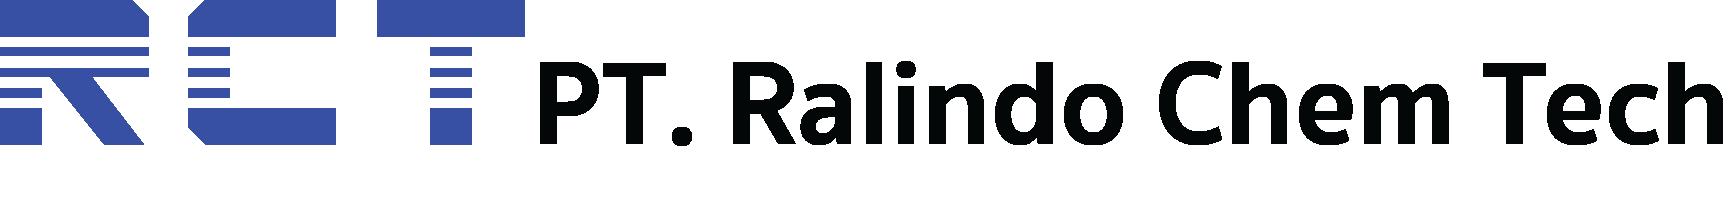 P.T Ralindo Chem Tech logo